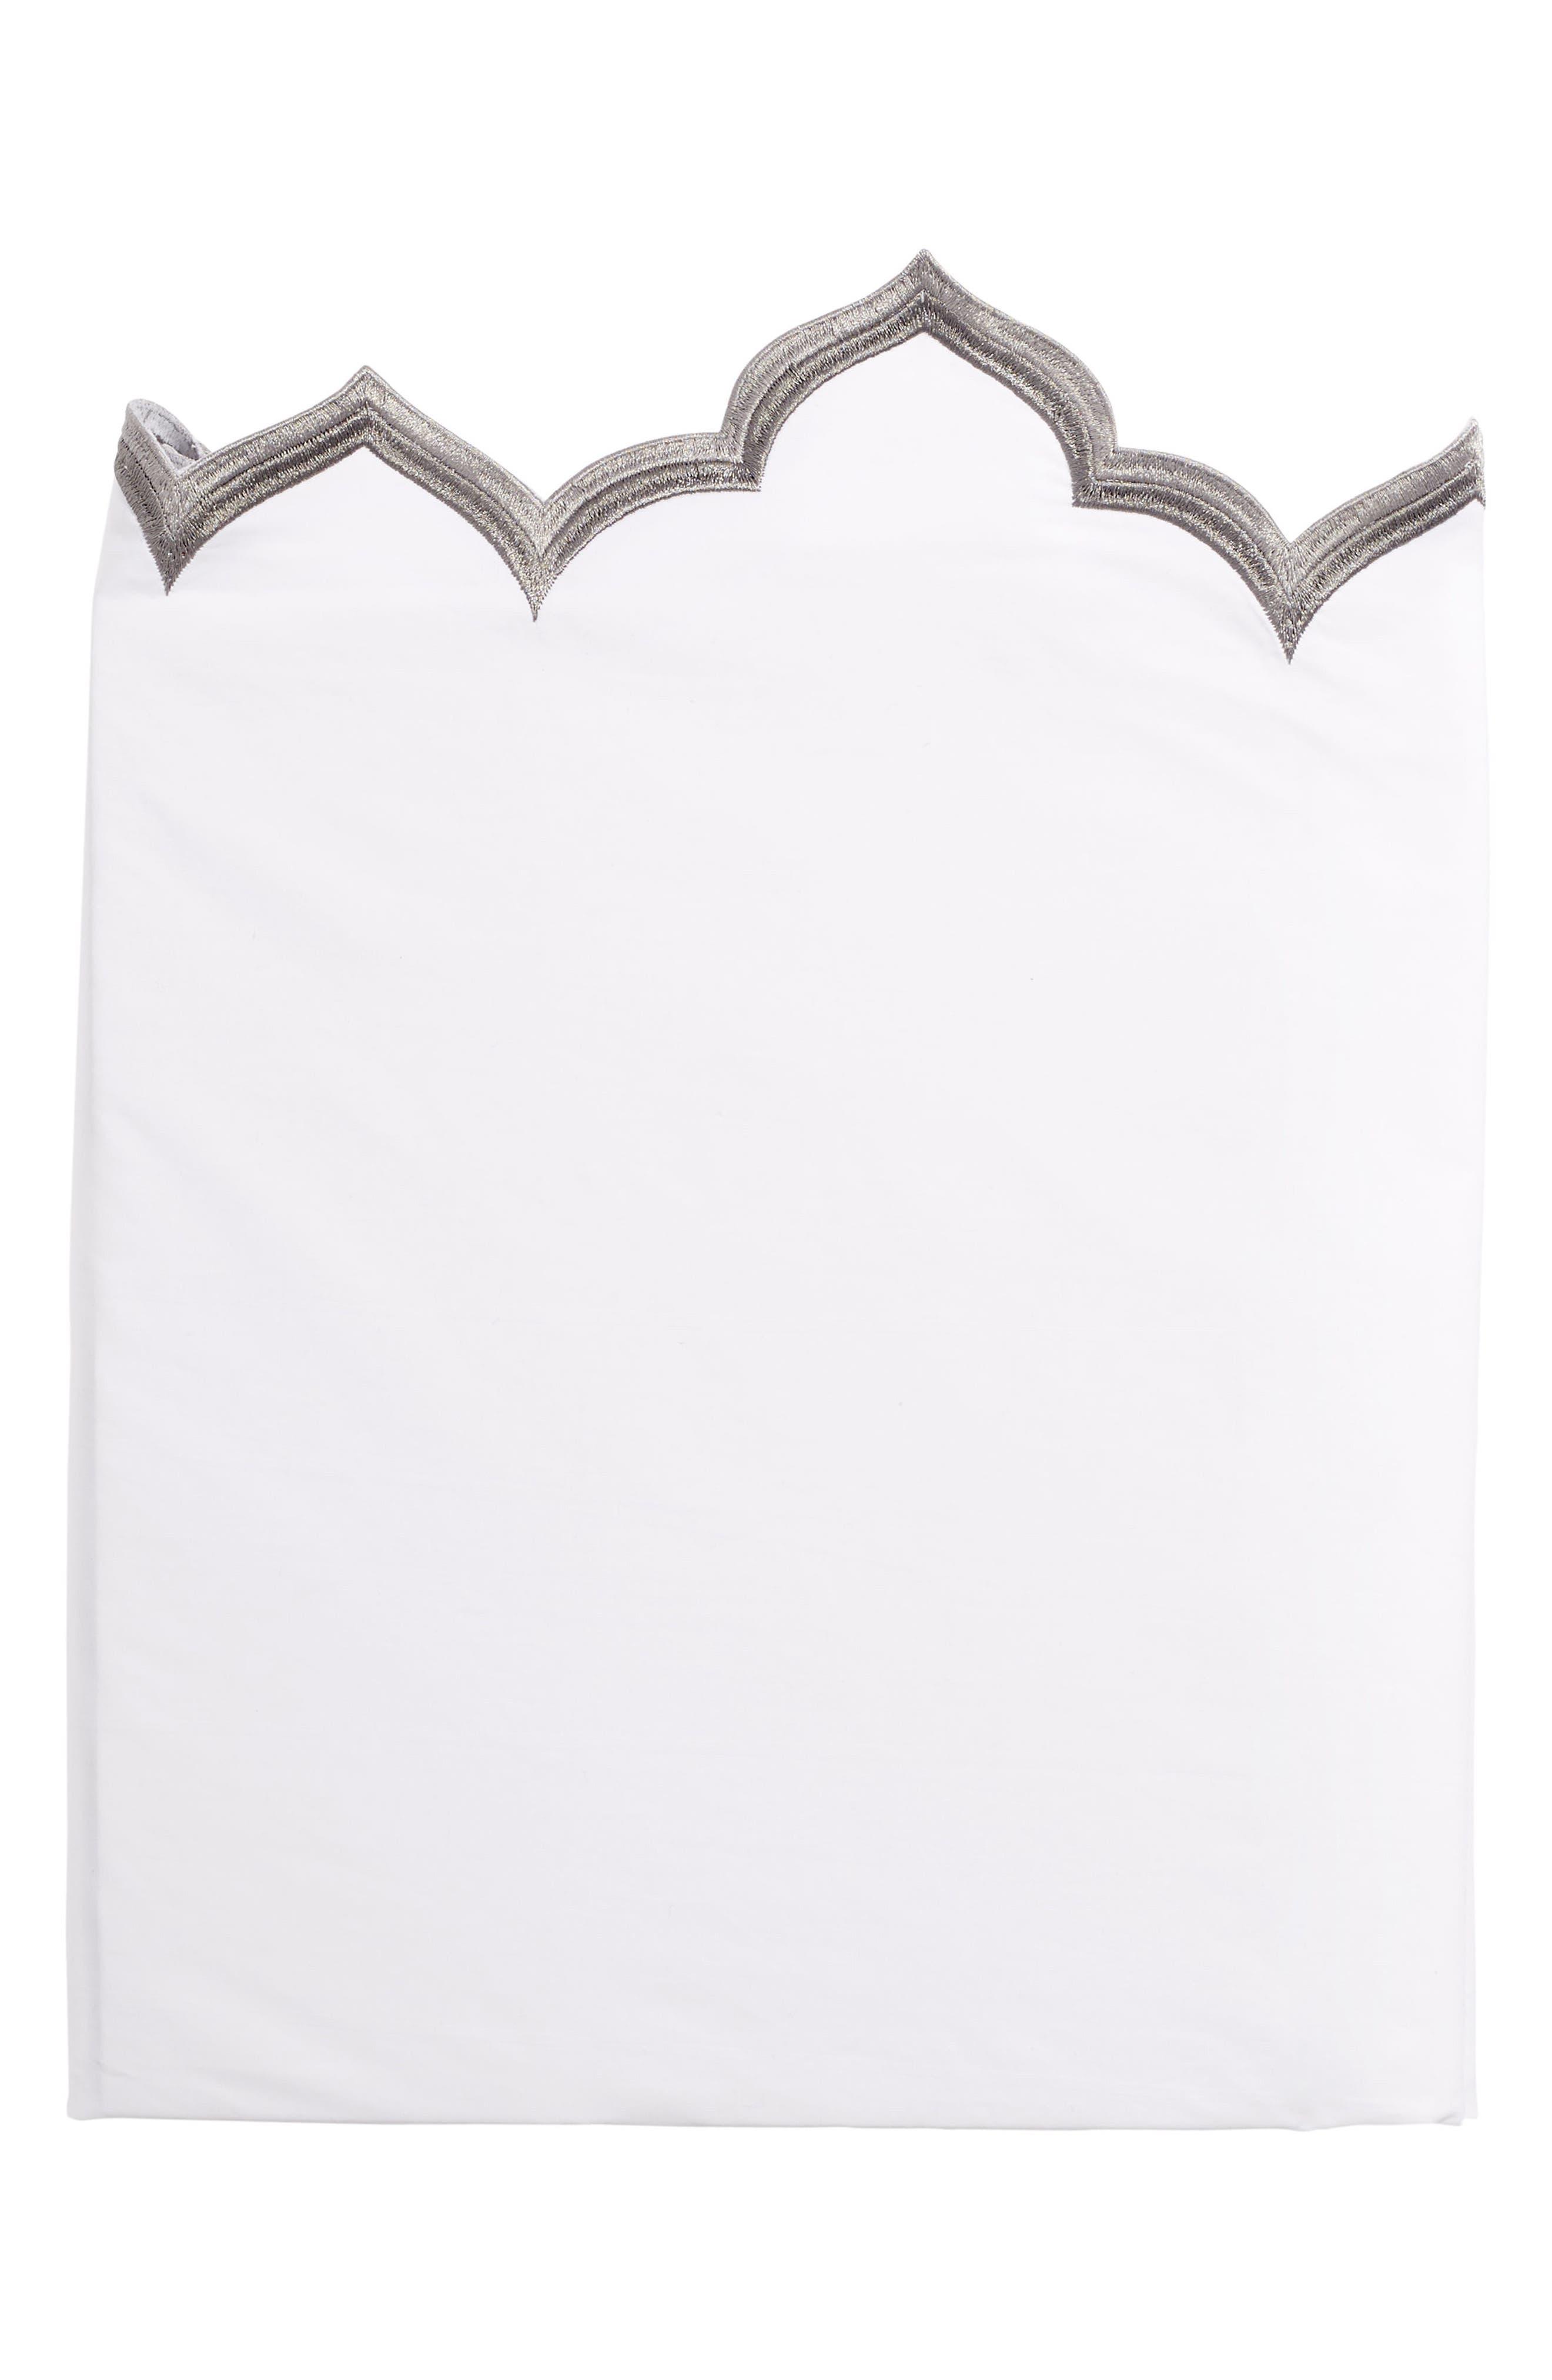 Sakuna 300 Thread Count Flat Sheet,                         Main,                         color, White/ Gray